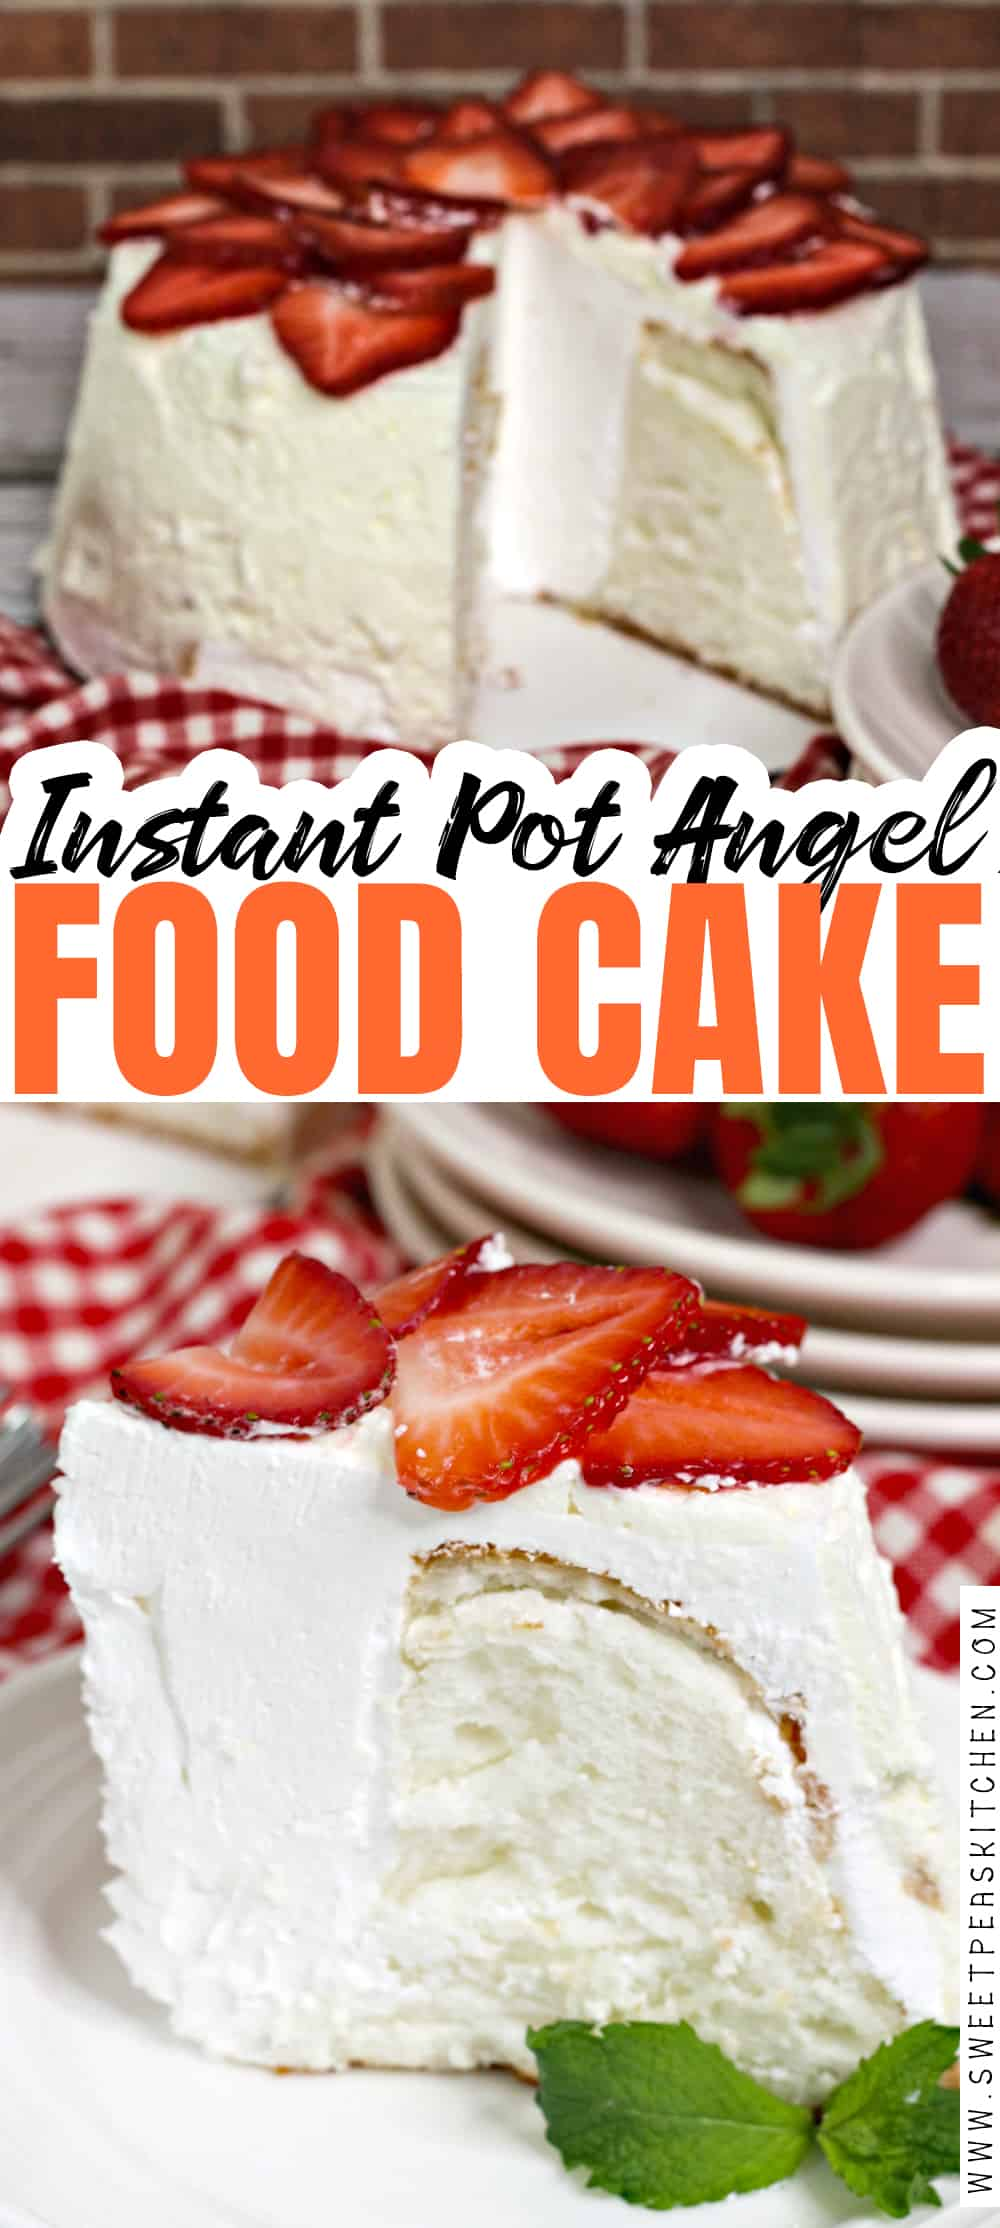 Instant Pot Angel Food Cake